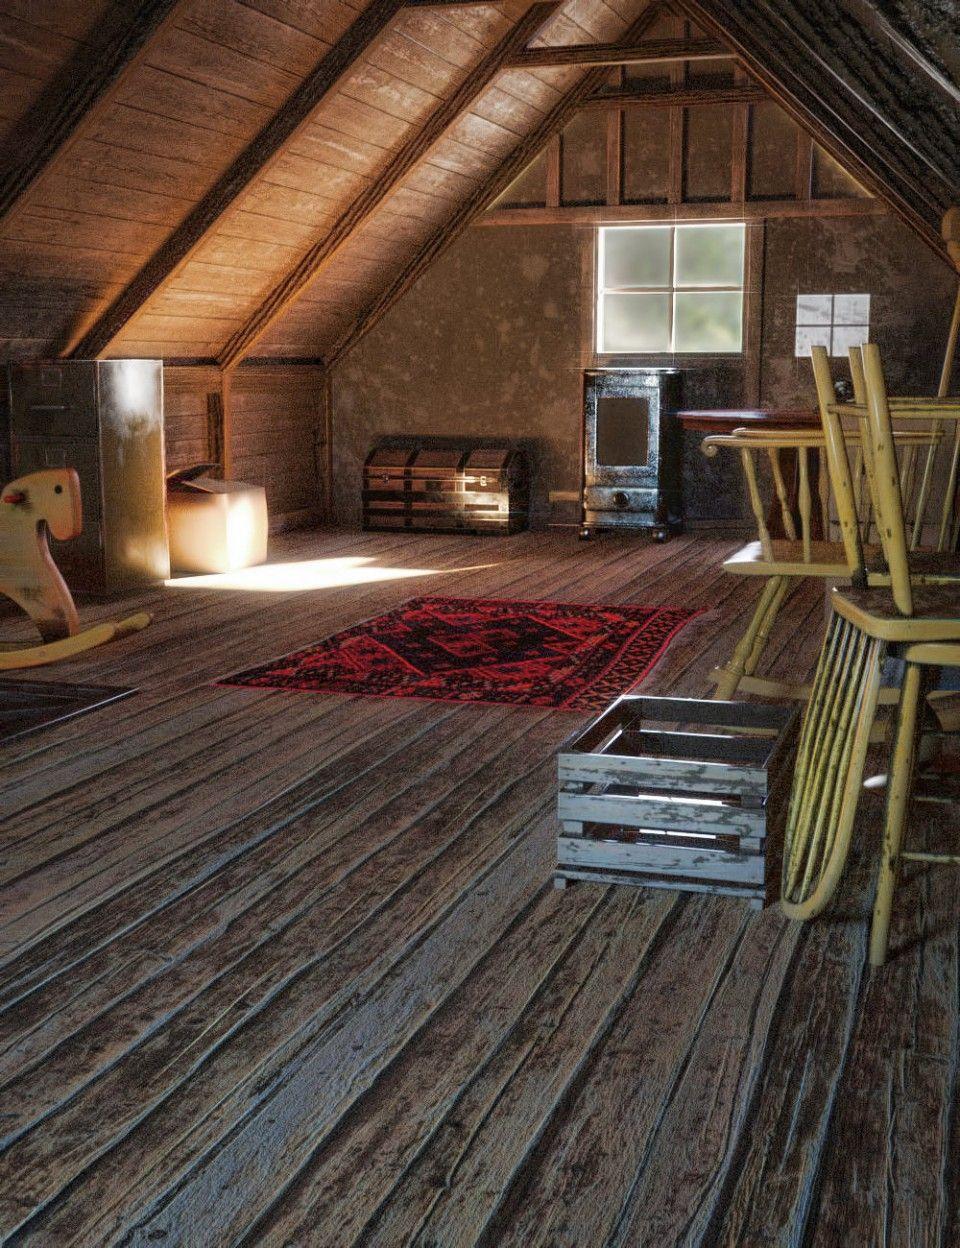 old attic  dazd places  pinterest  attic. old attic